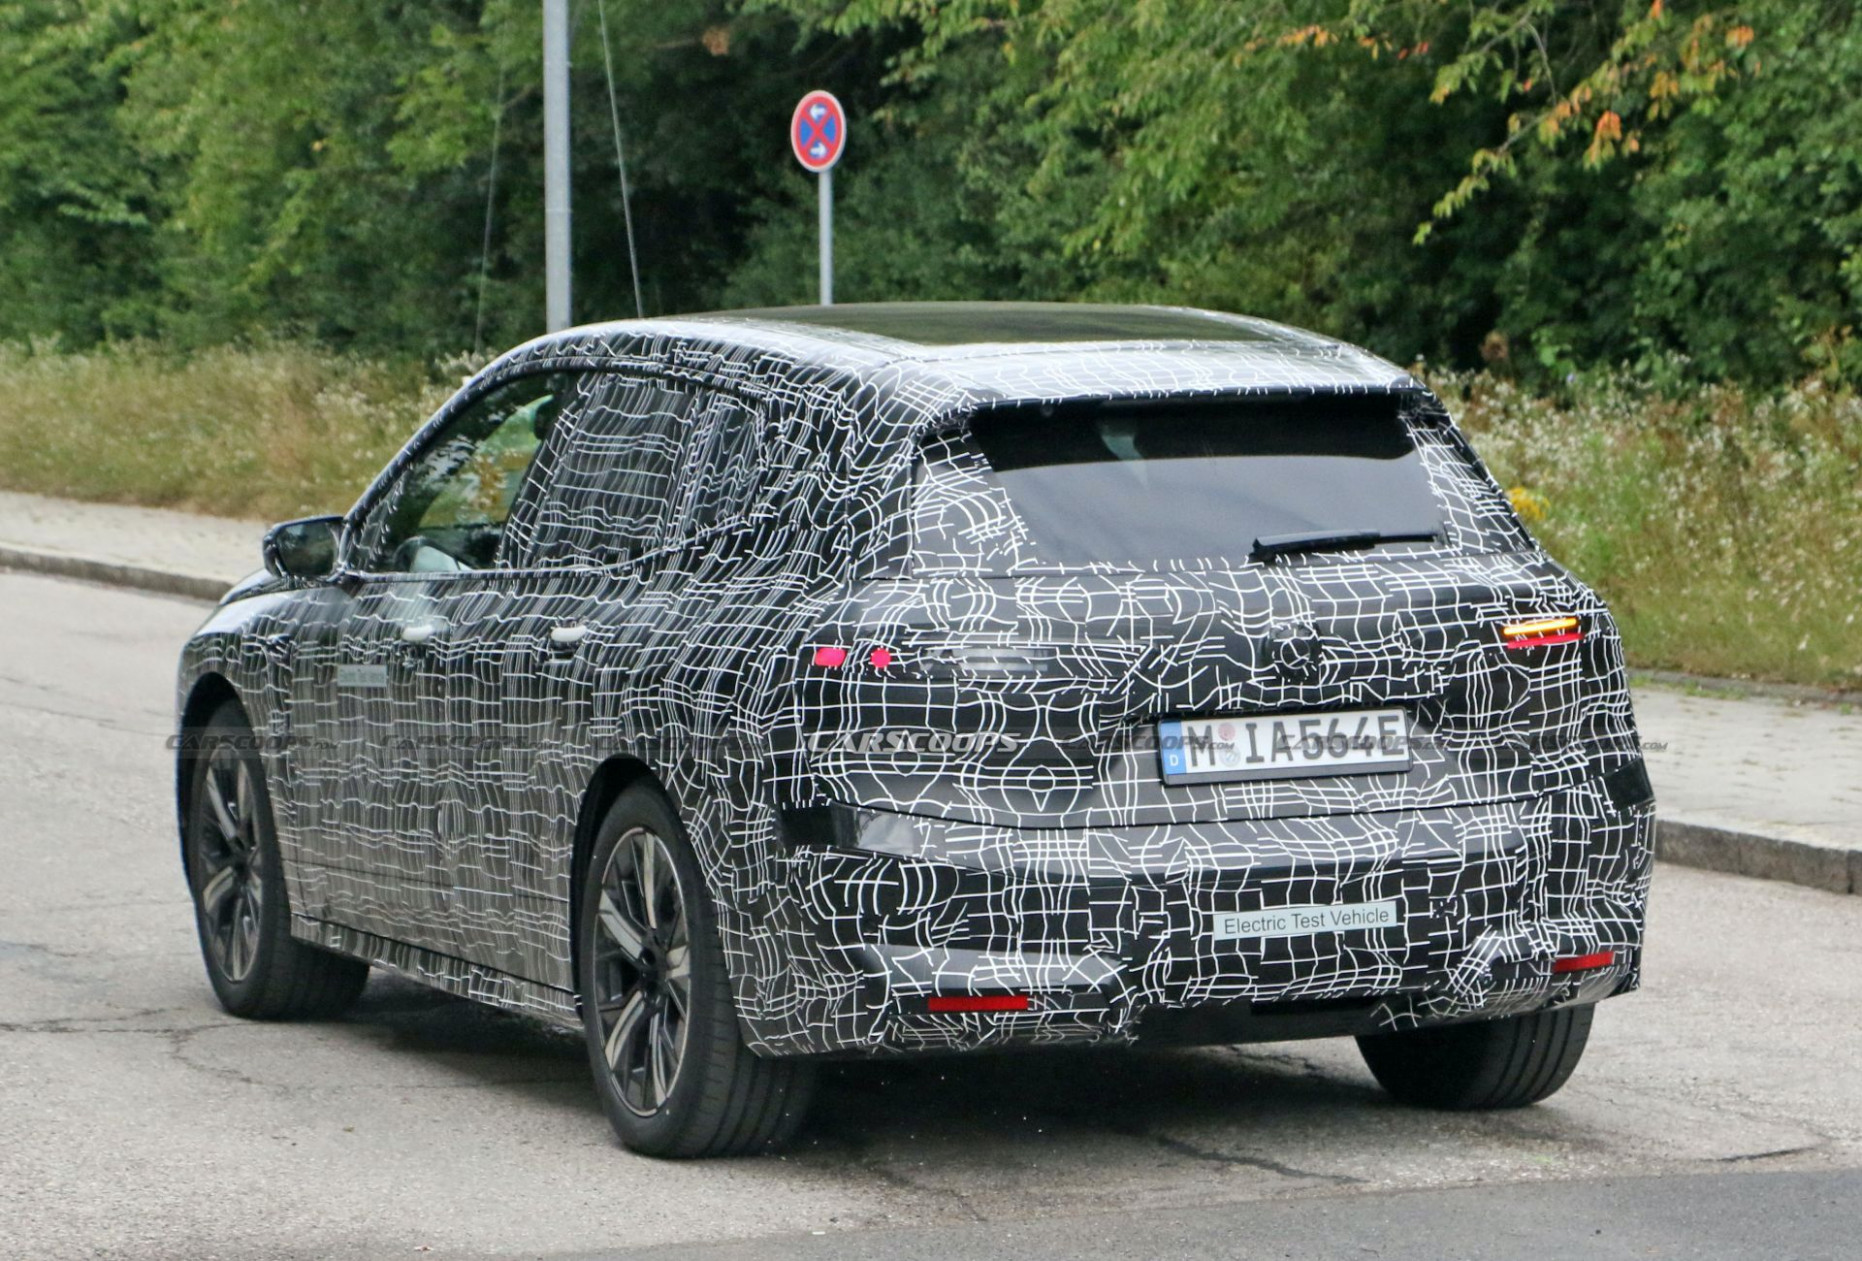 Wallpaper BMW Electric Suv 2022